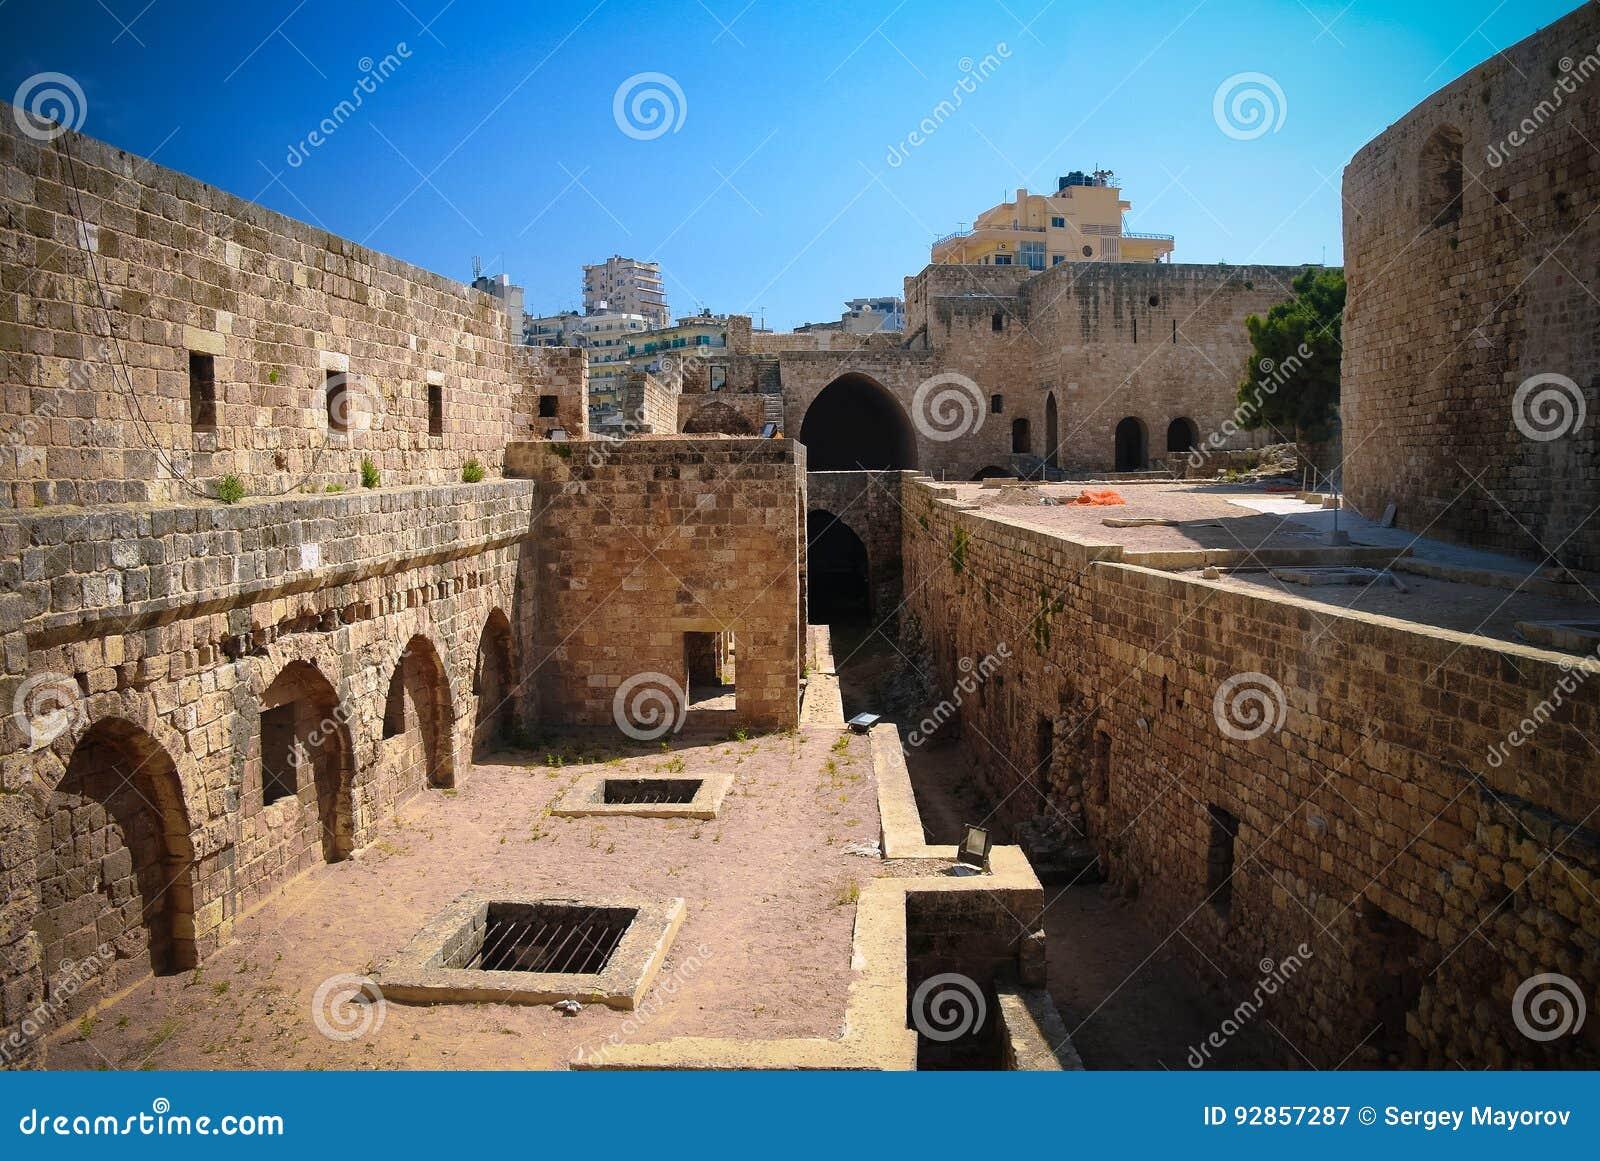 Panorama der Zitadelle des Raymond de Saint-Gilles-alias Pilger-Hügels, Tripoli, der Libanon